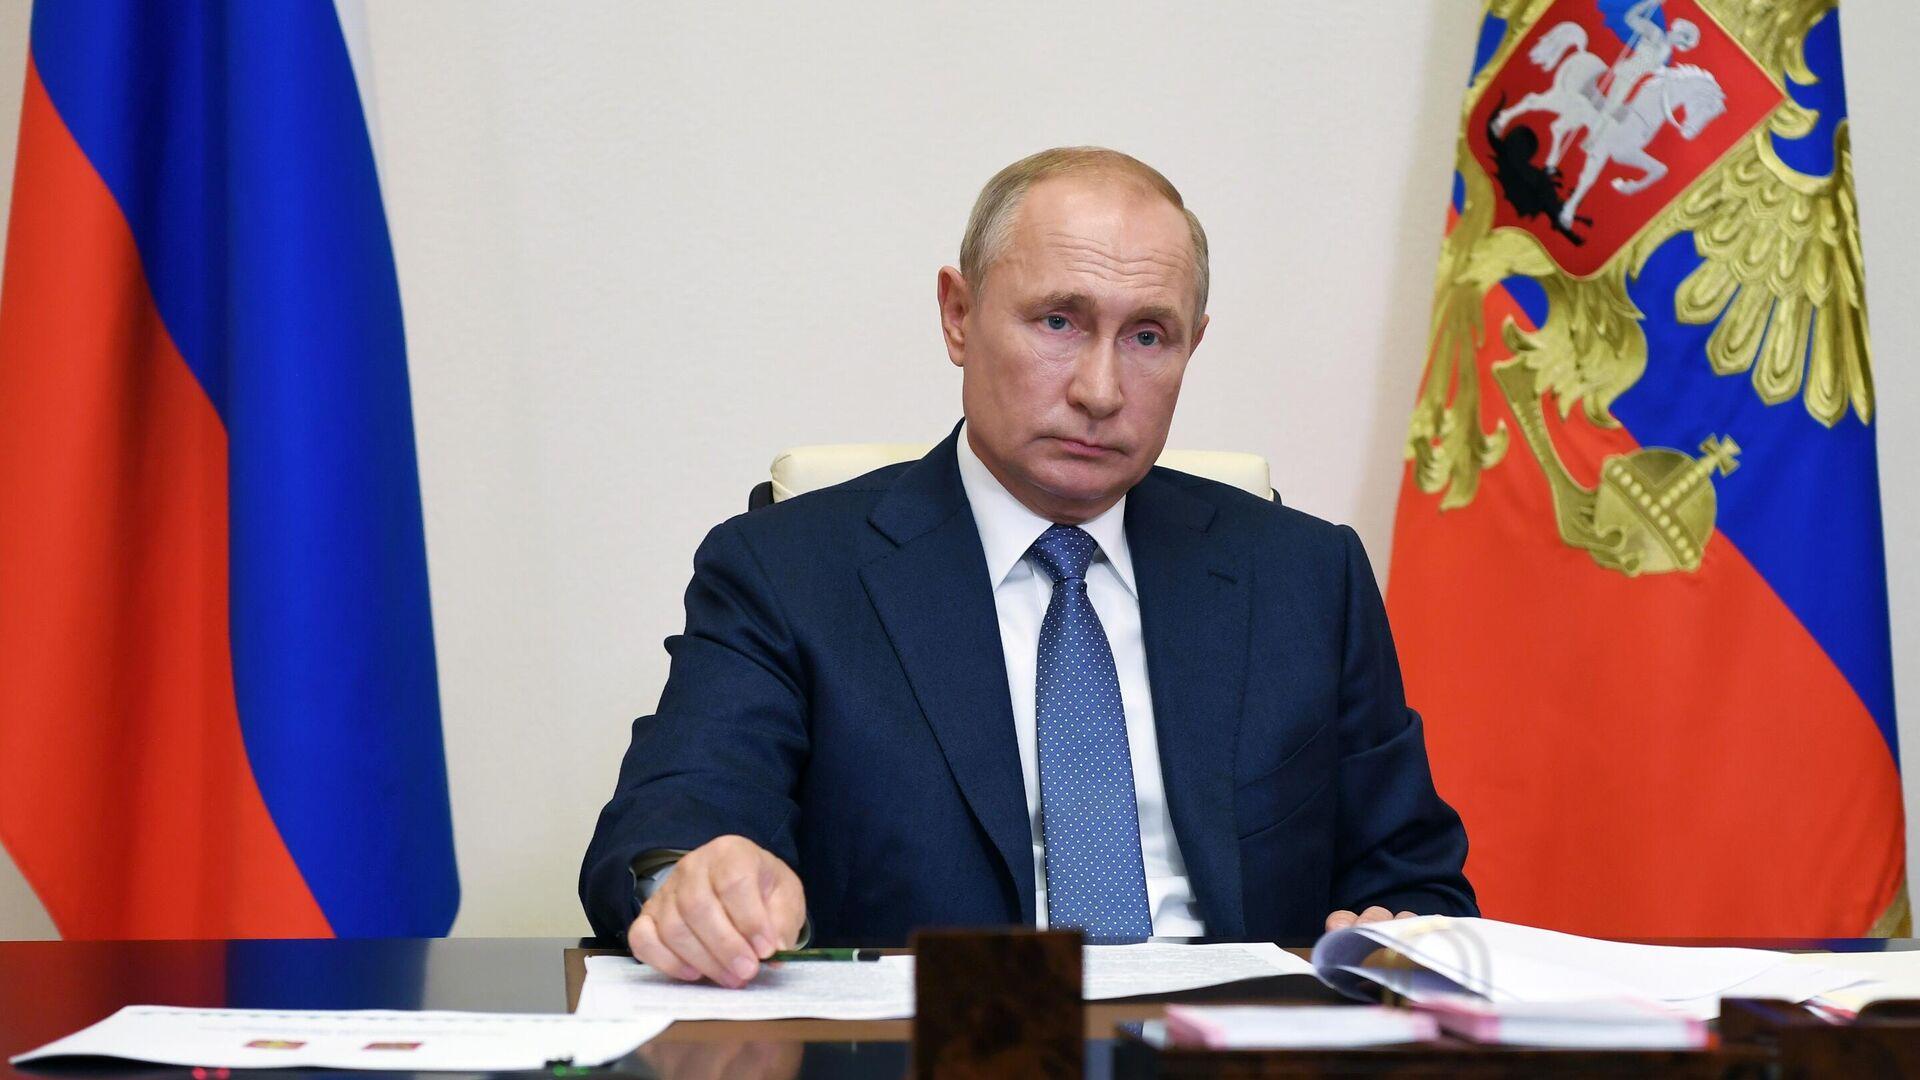 Президент РФ Владимир Путин - РИА Новости, 1920, 01.09.2020